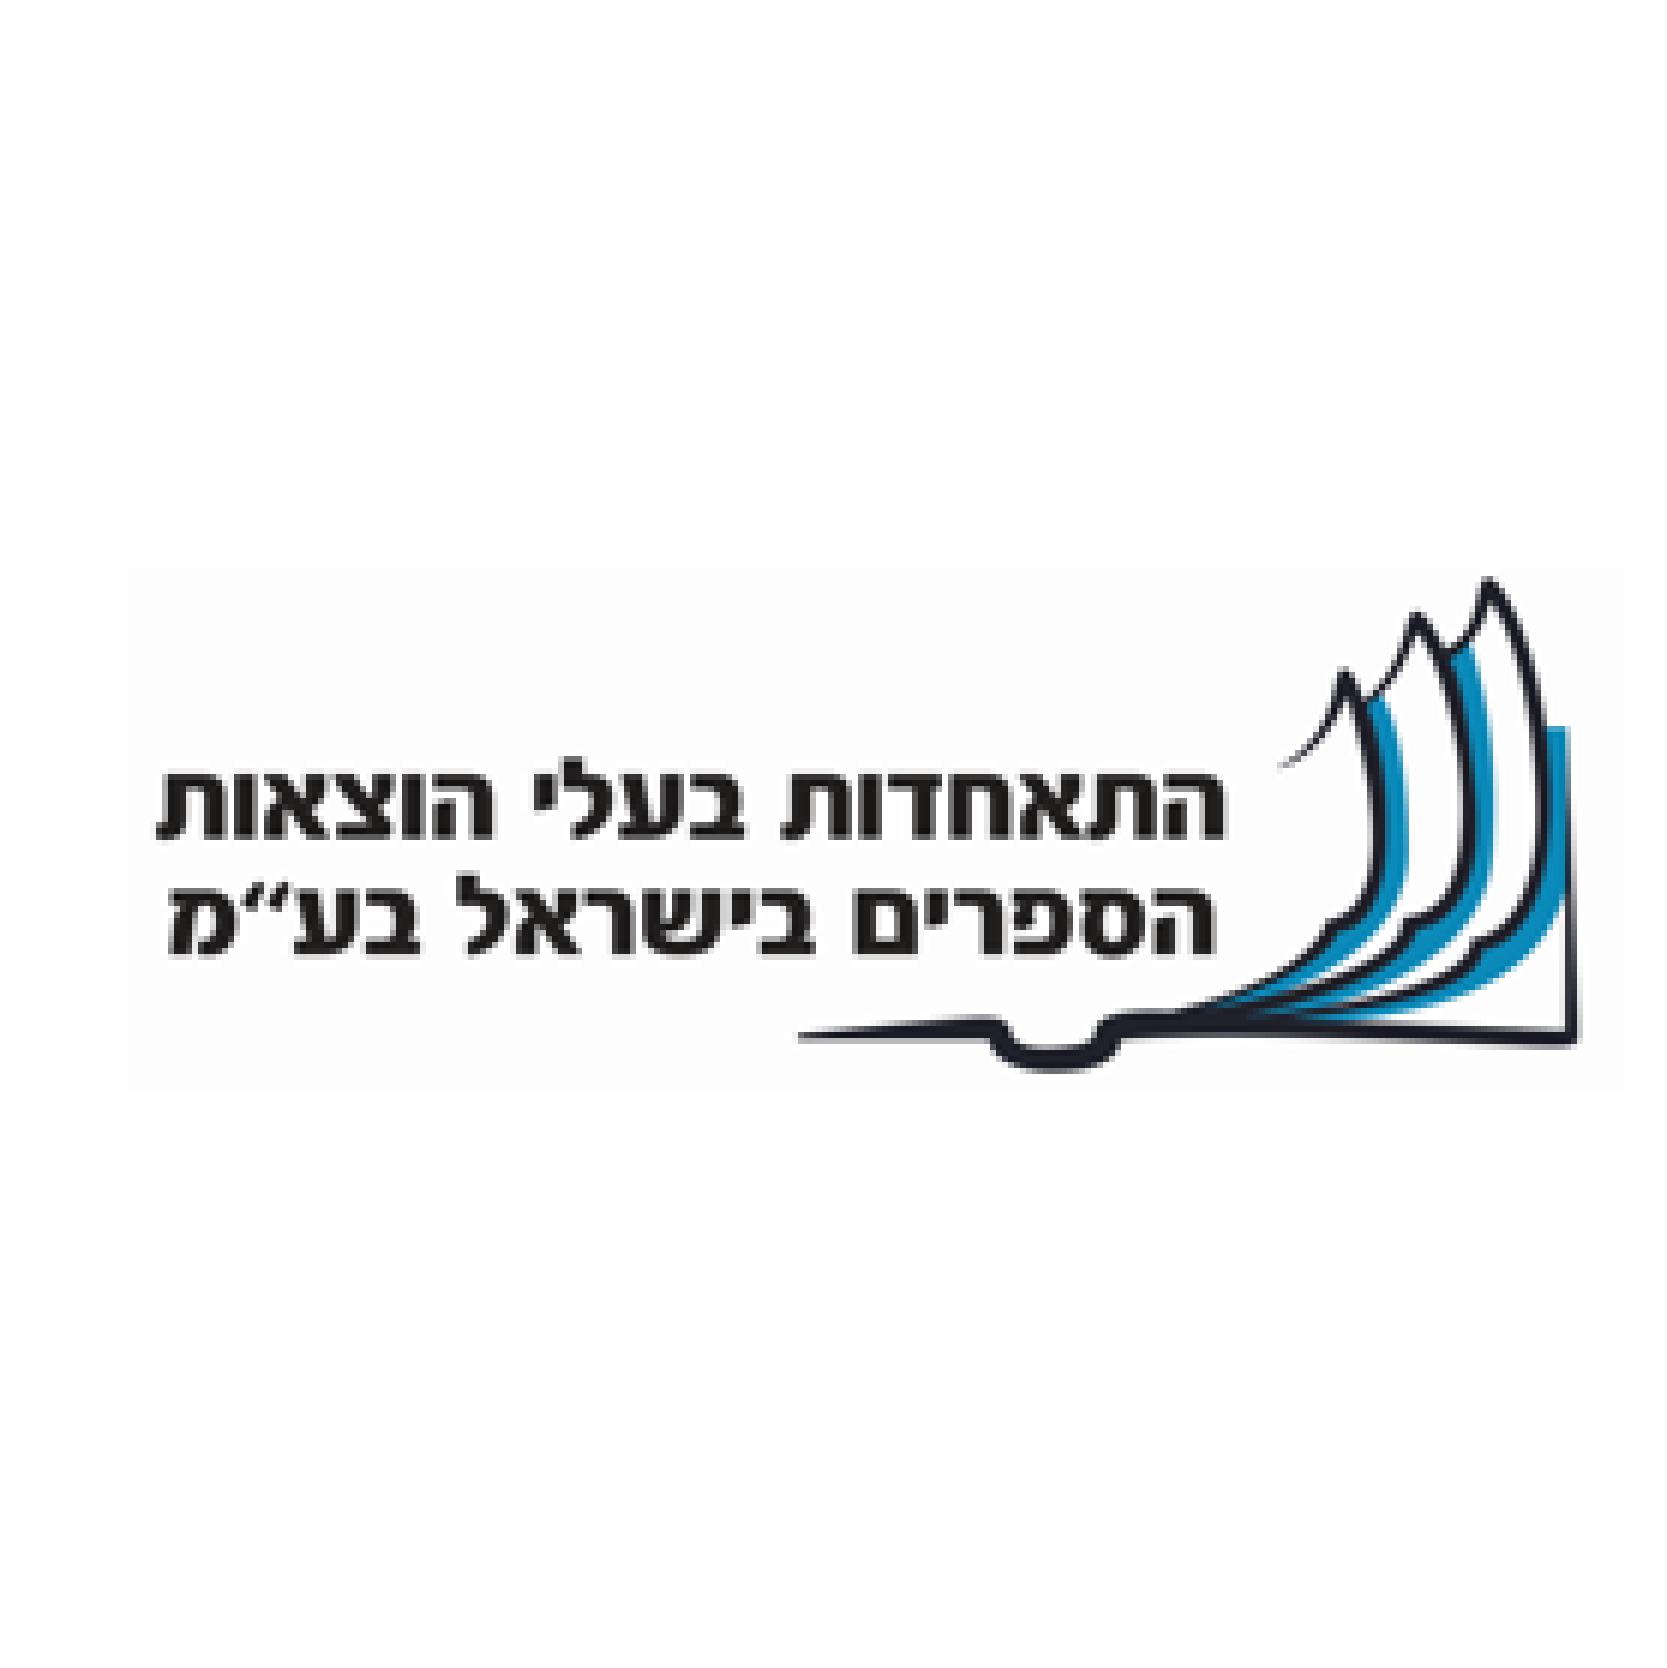 The_Israeli_Association_400X400